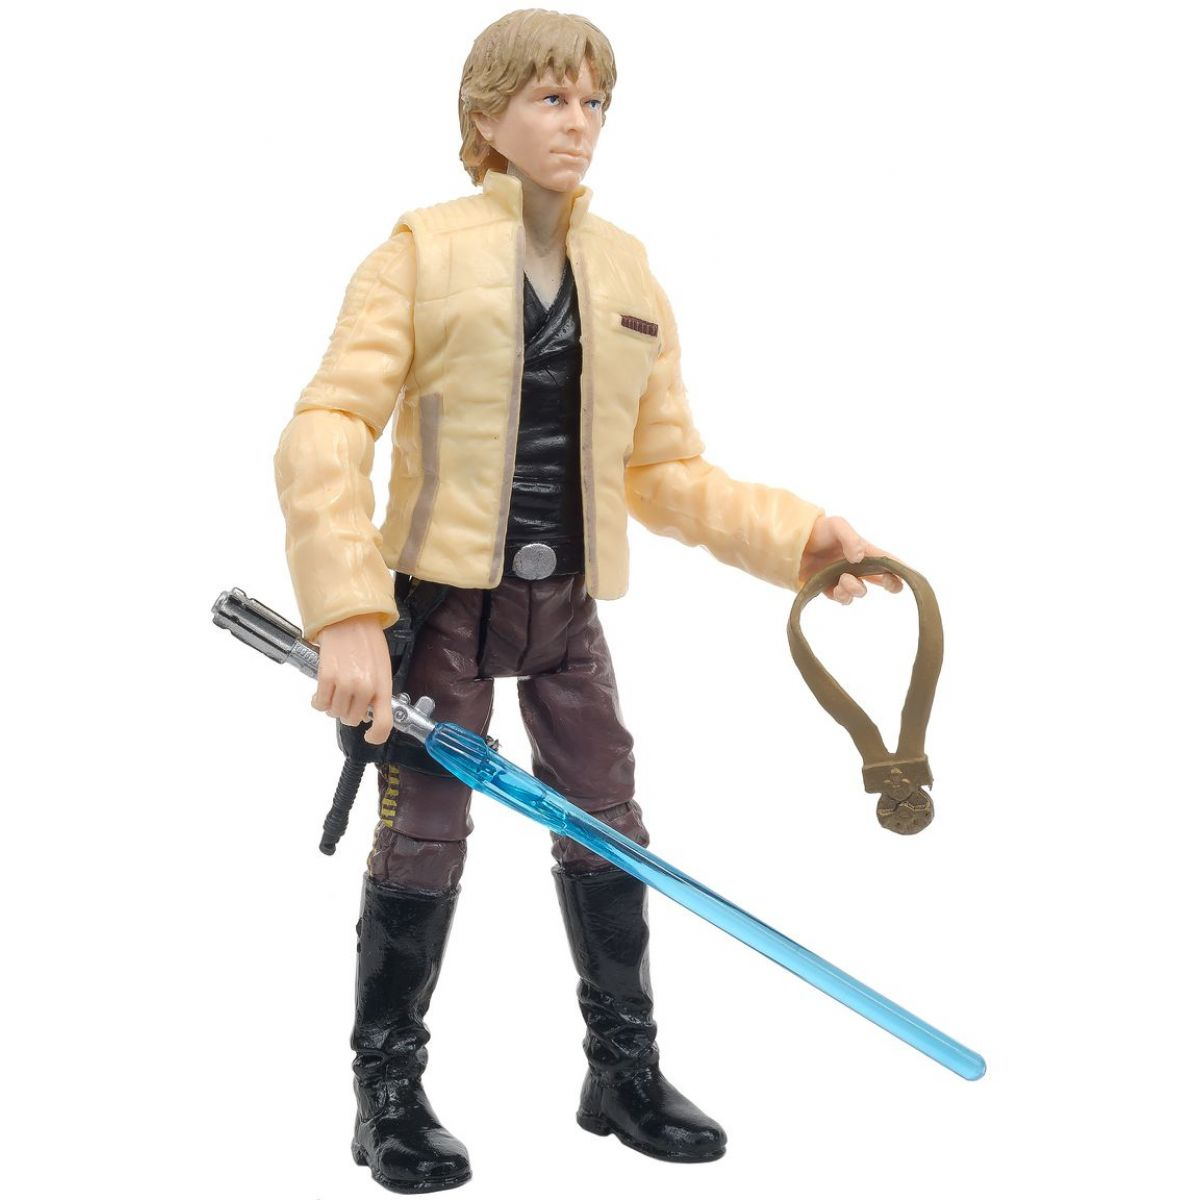 Hasbro Star Wars The Black Series - Luke Skywalker